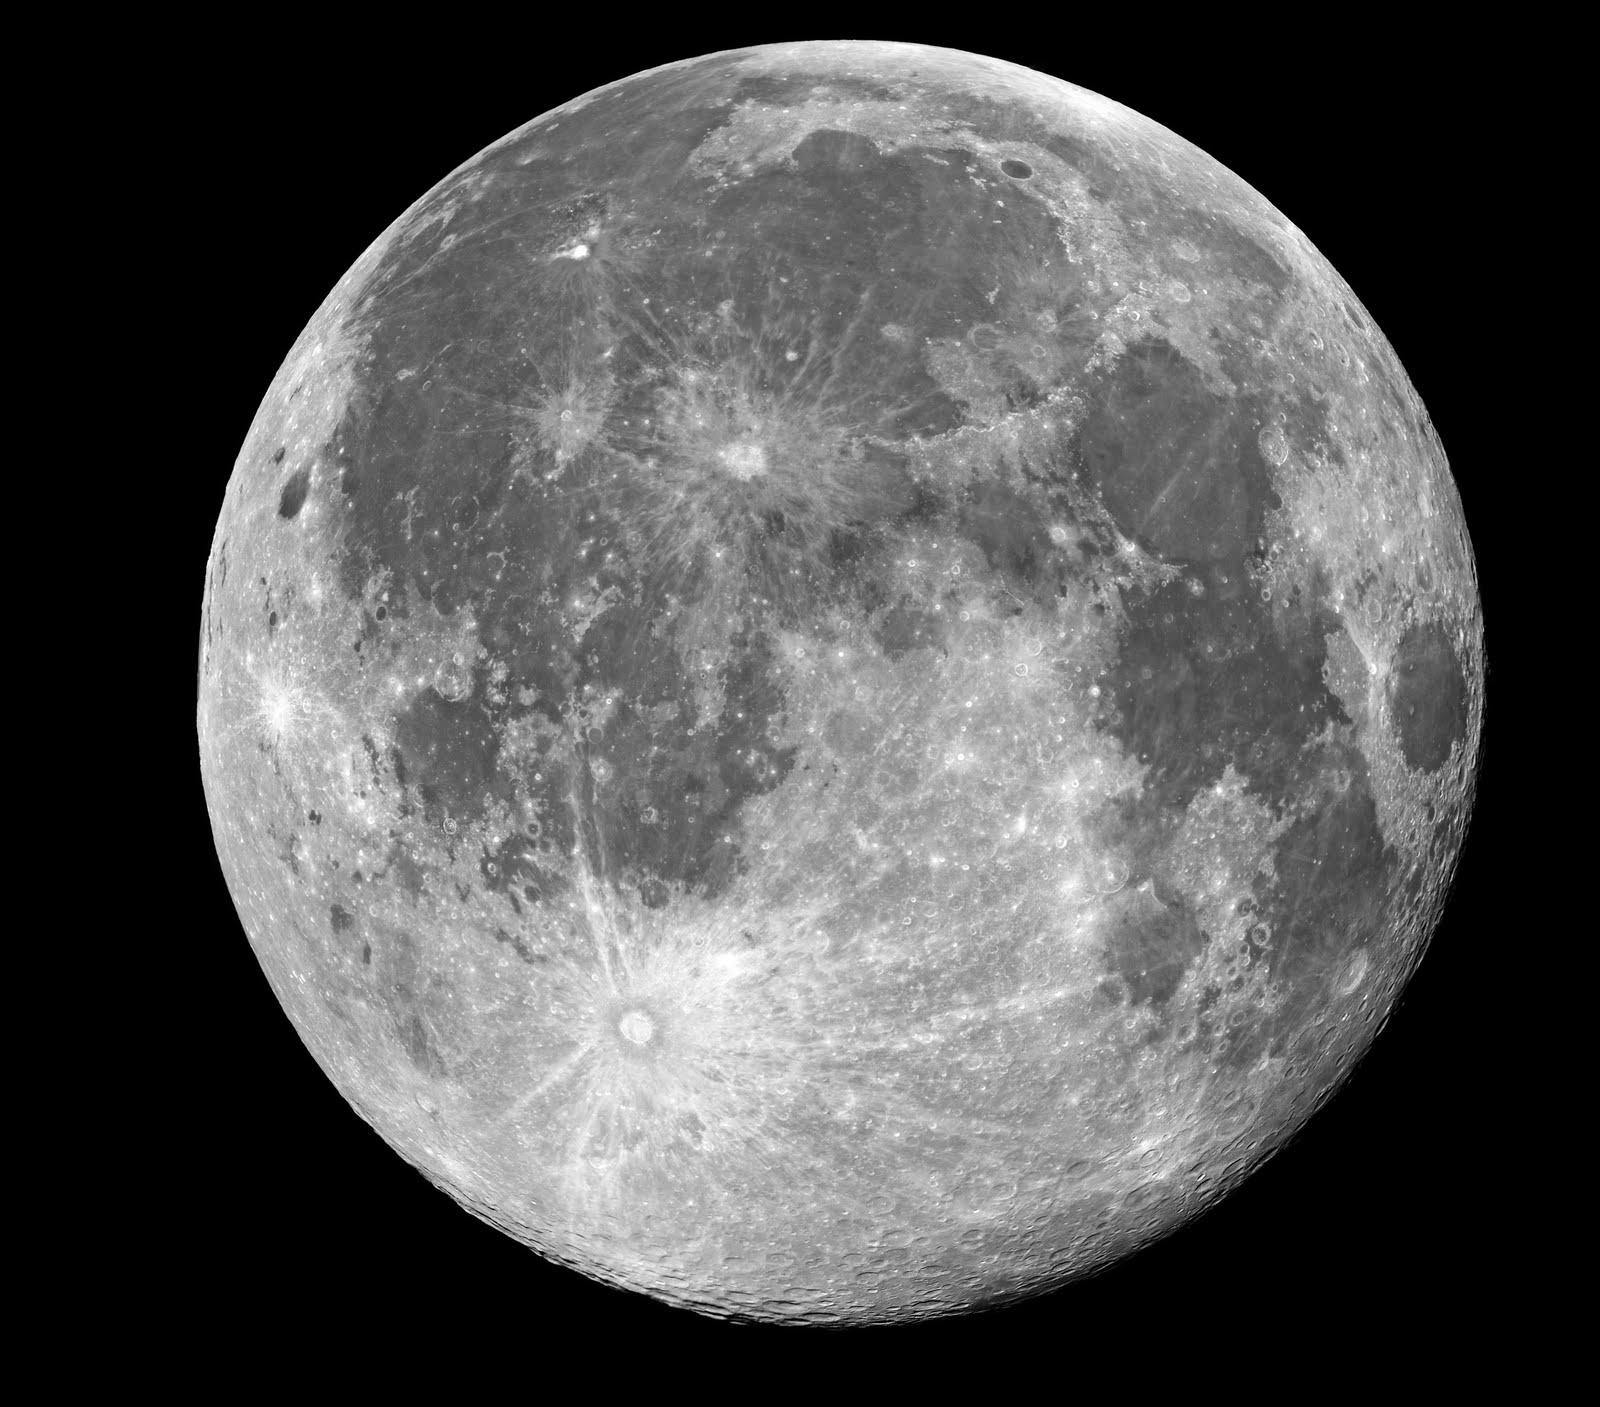 moon observation nasa - photo #15